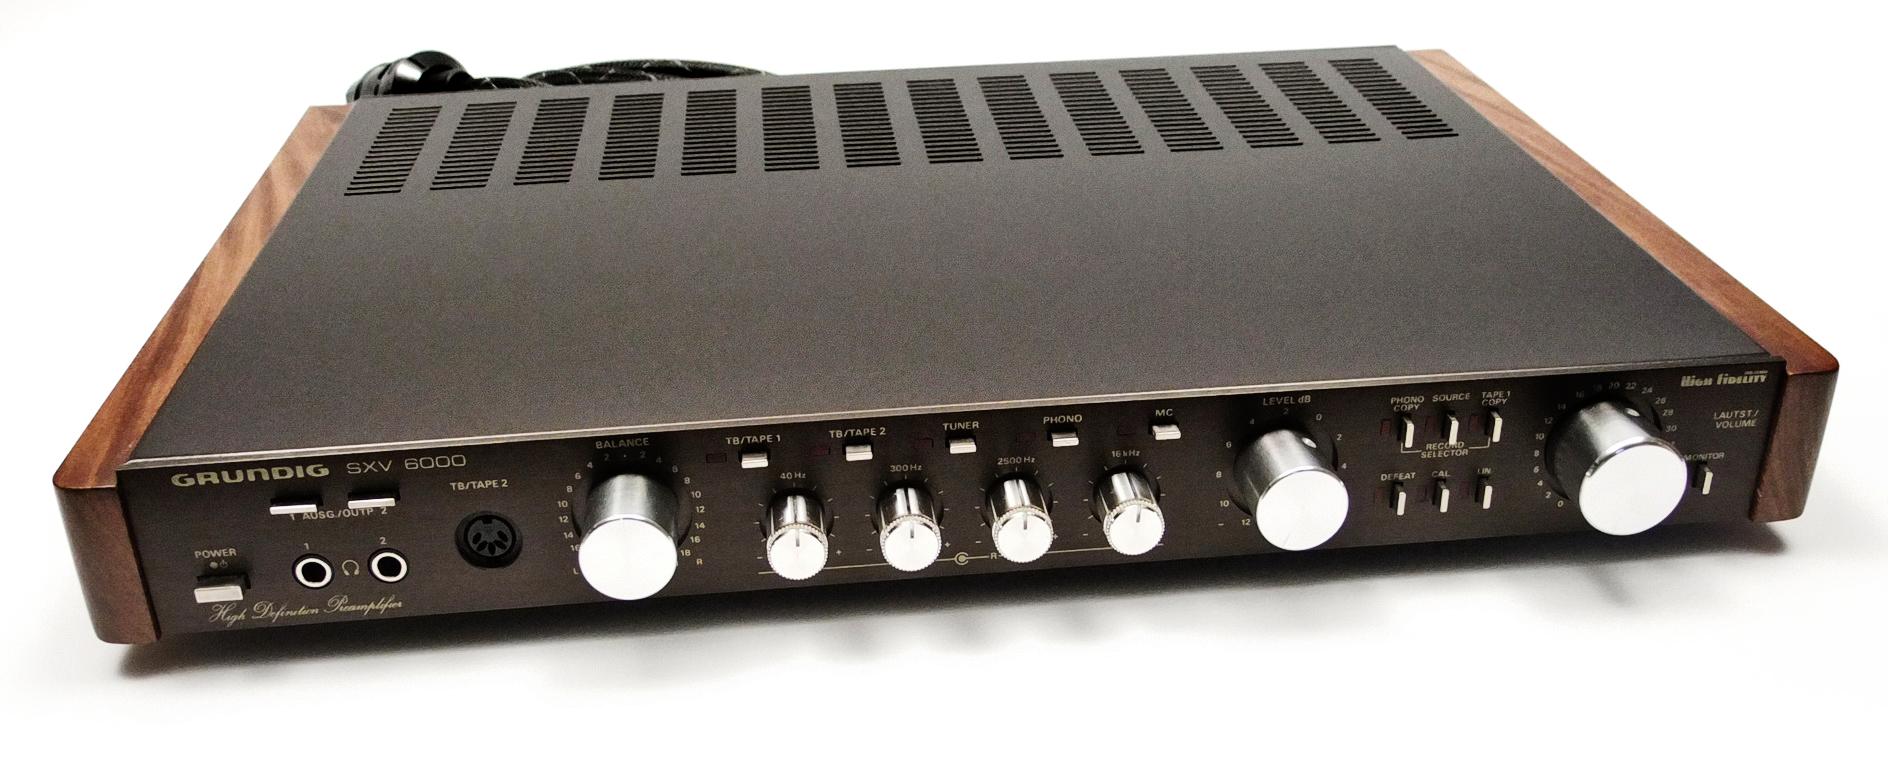 Grundig sxv6000 Upgrade by Audio Oasi